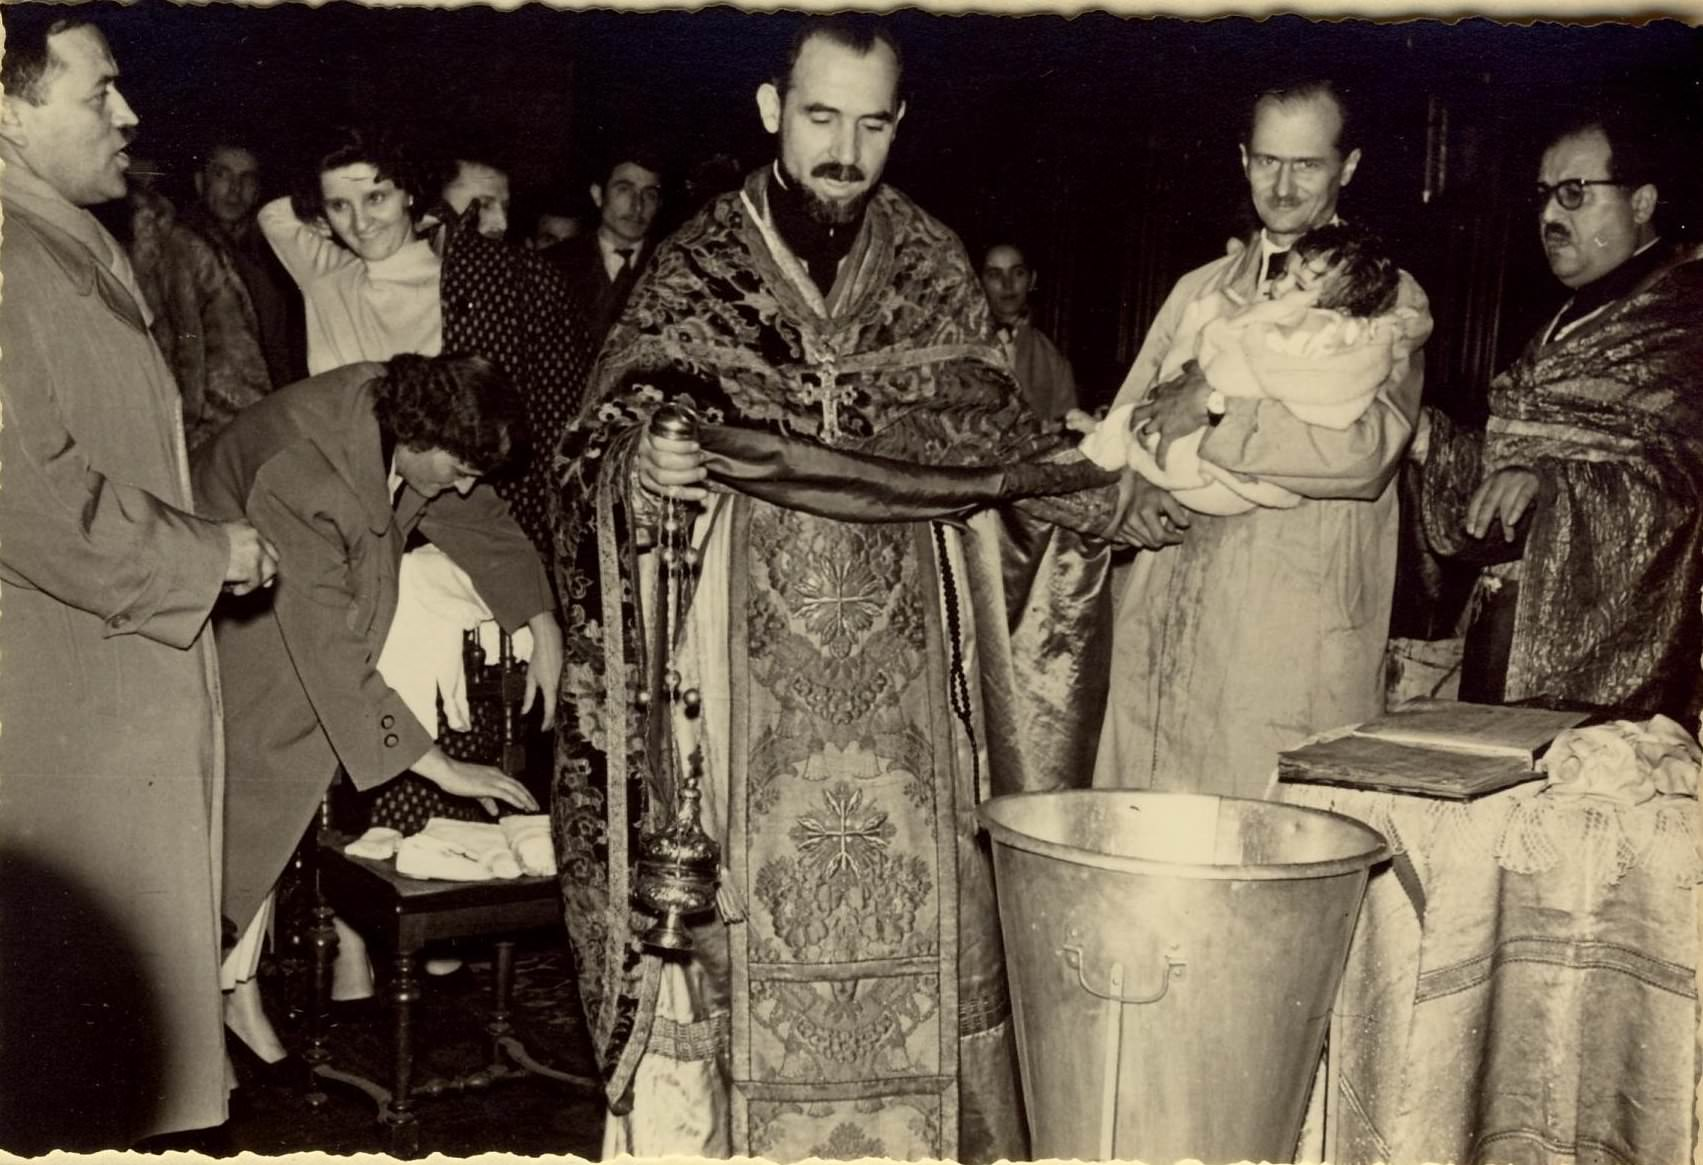 Arhim. R. Gratian, Pr. V. Boldeanu, Ing. D. Sfintescu - Botezul lui Rodica Popa - Paris 1956 hp 1